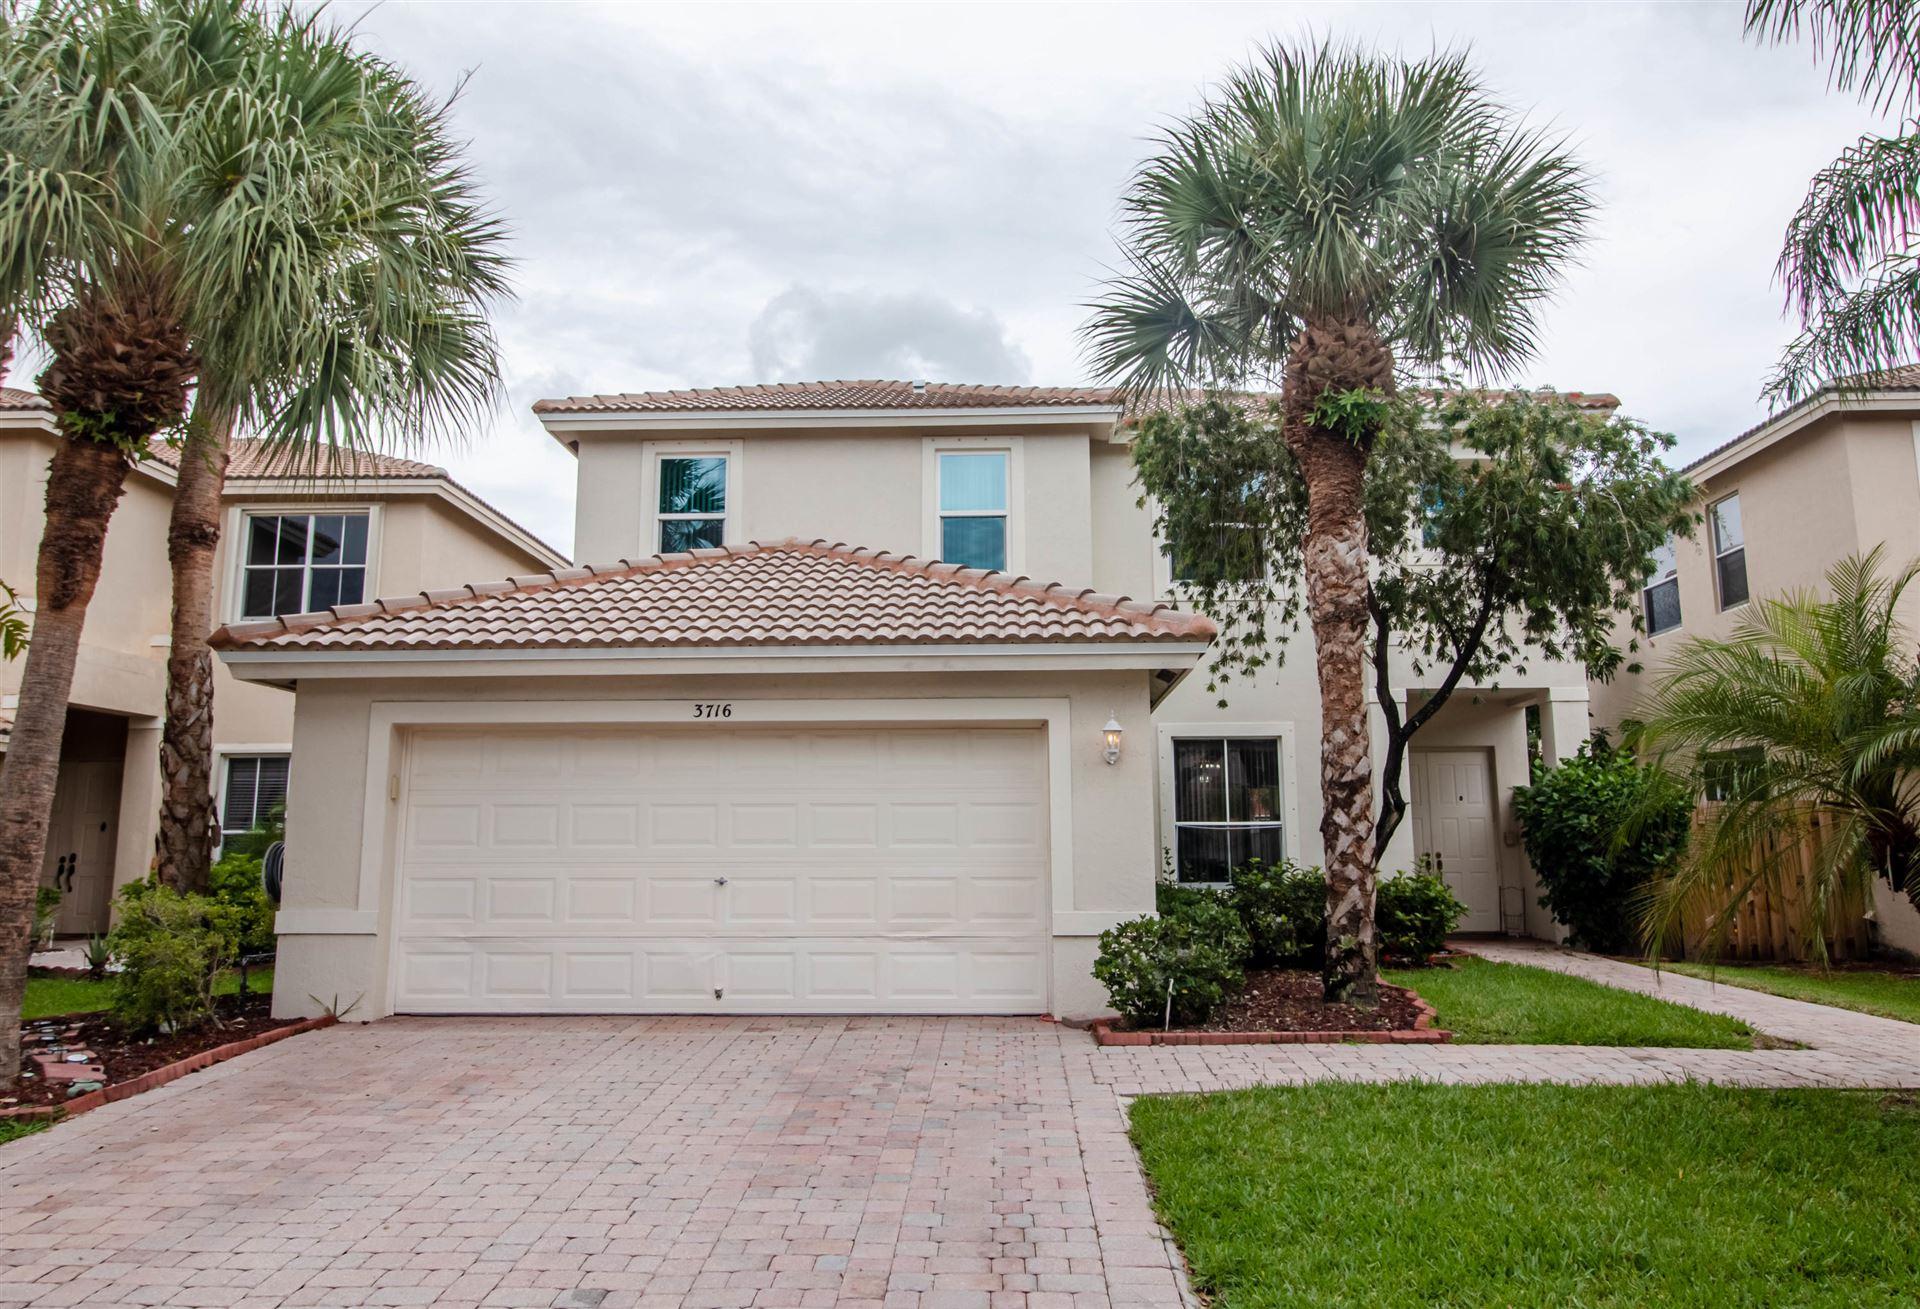 3716 Torres Circle, West Palm Beach, FL 33409 - MLS#: RX-10727341